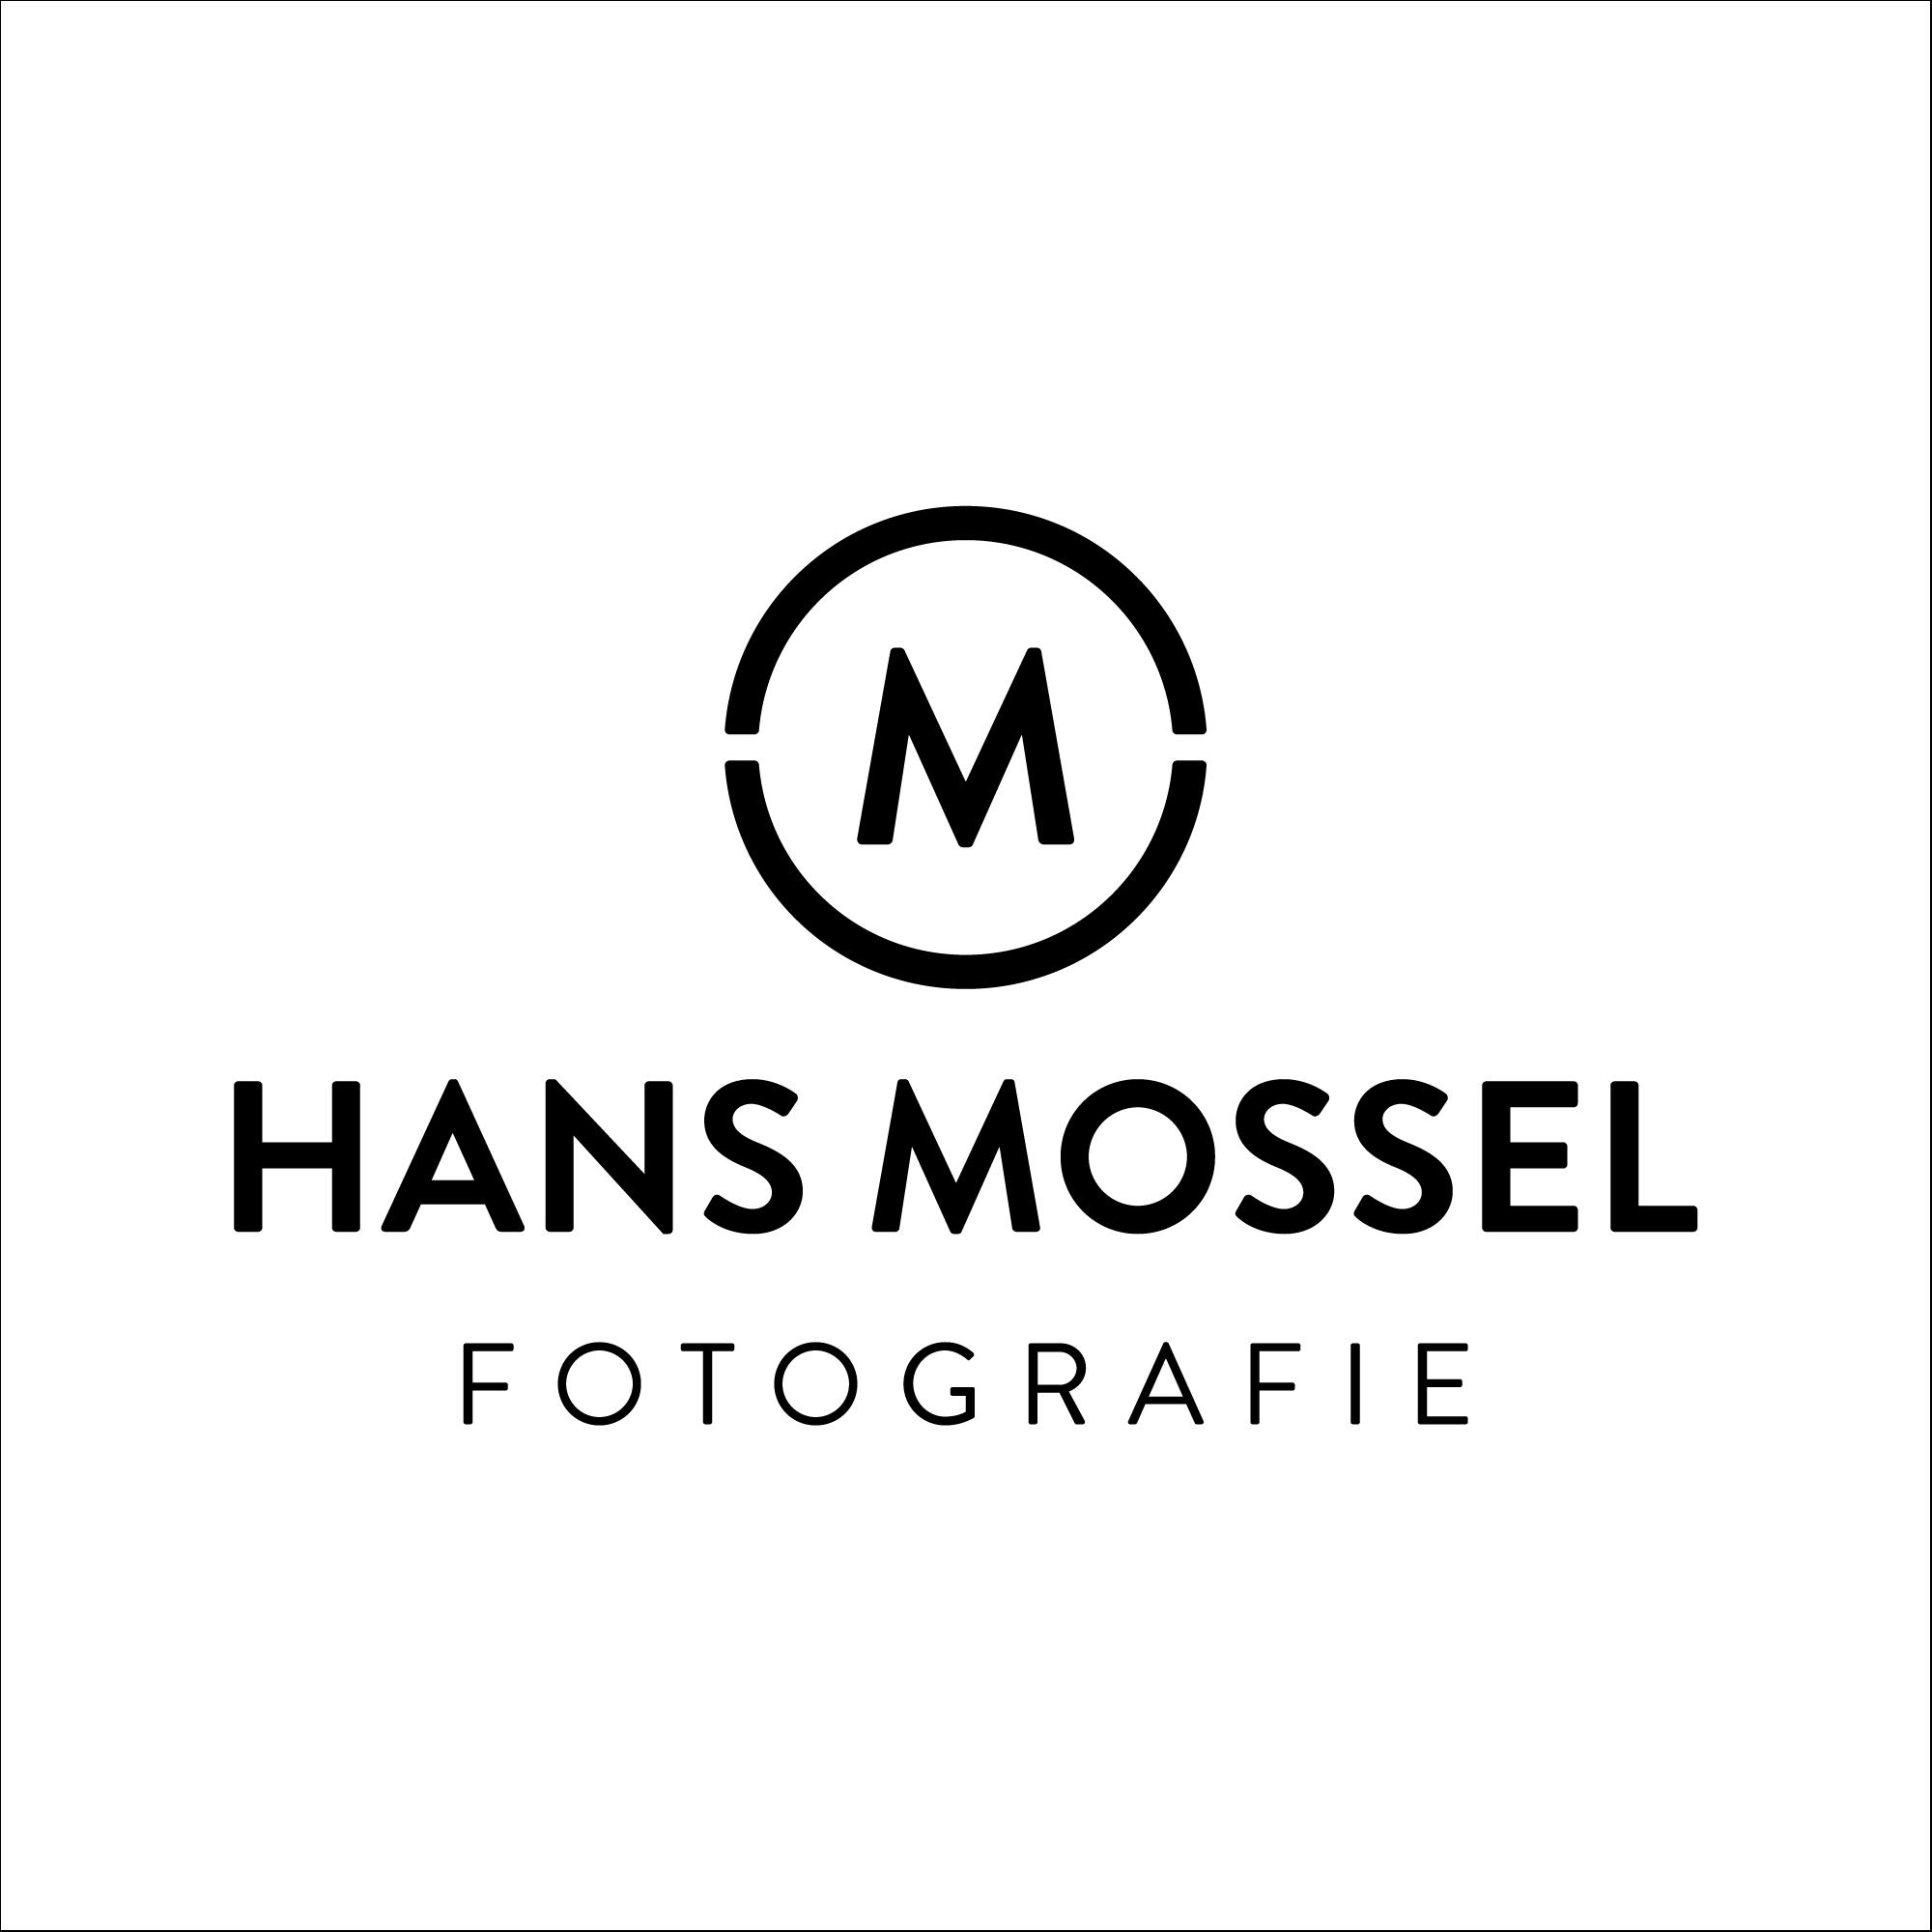 logo-hans-mossel-fotografie